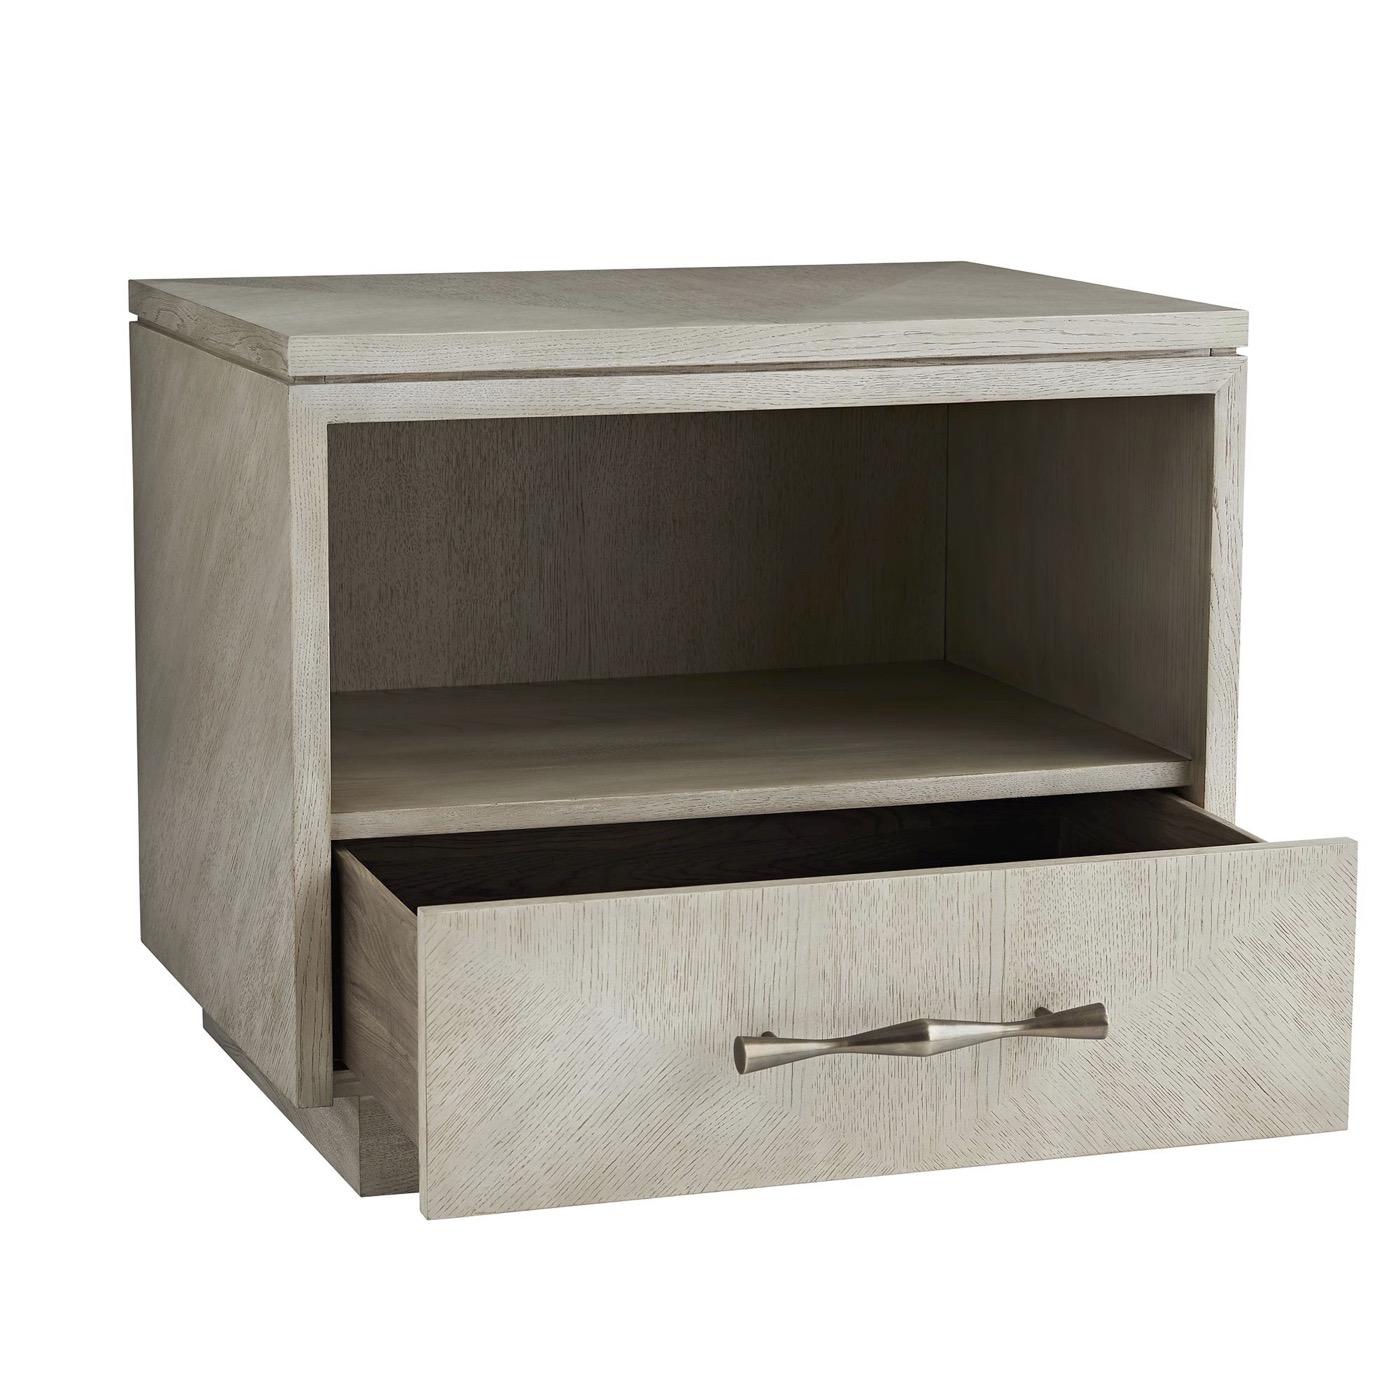 Ruben Side Table | Light Grey